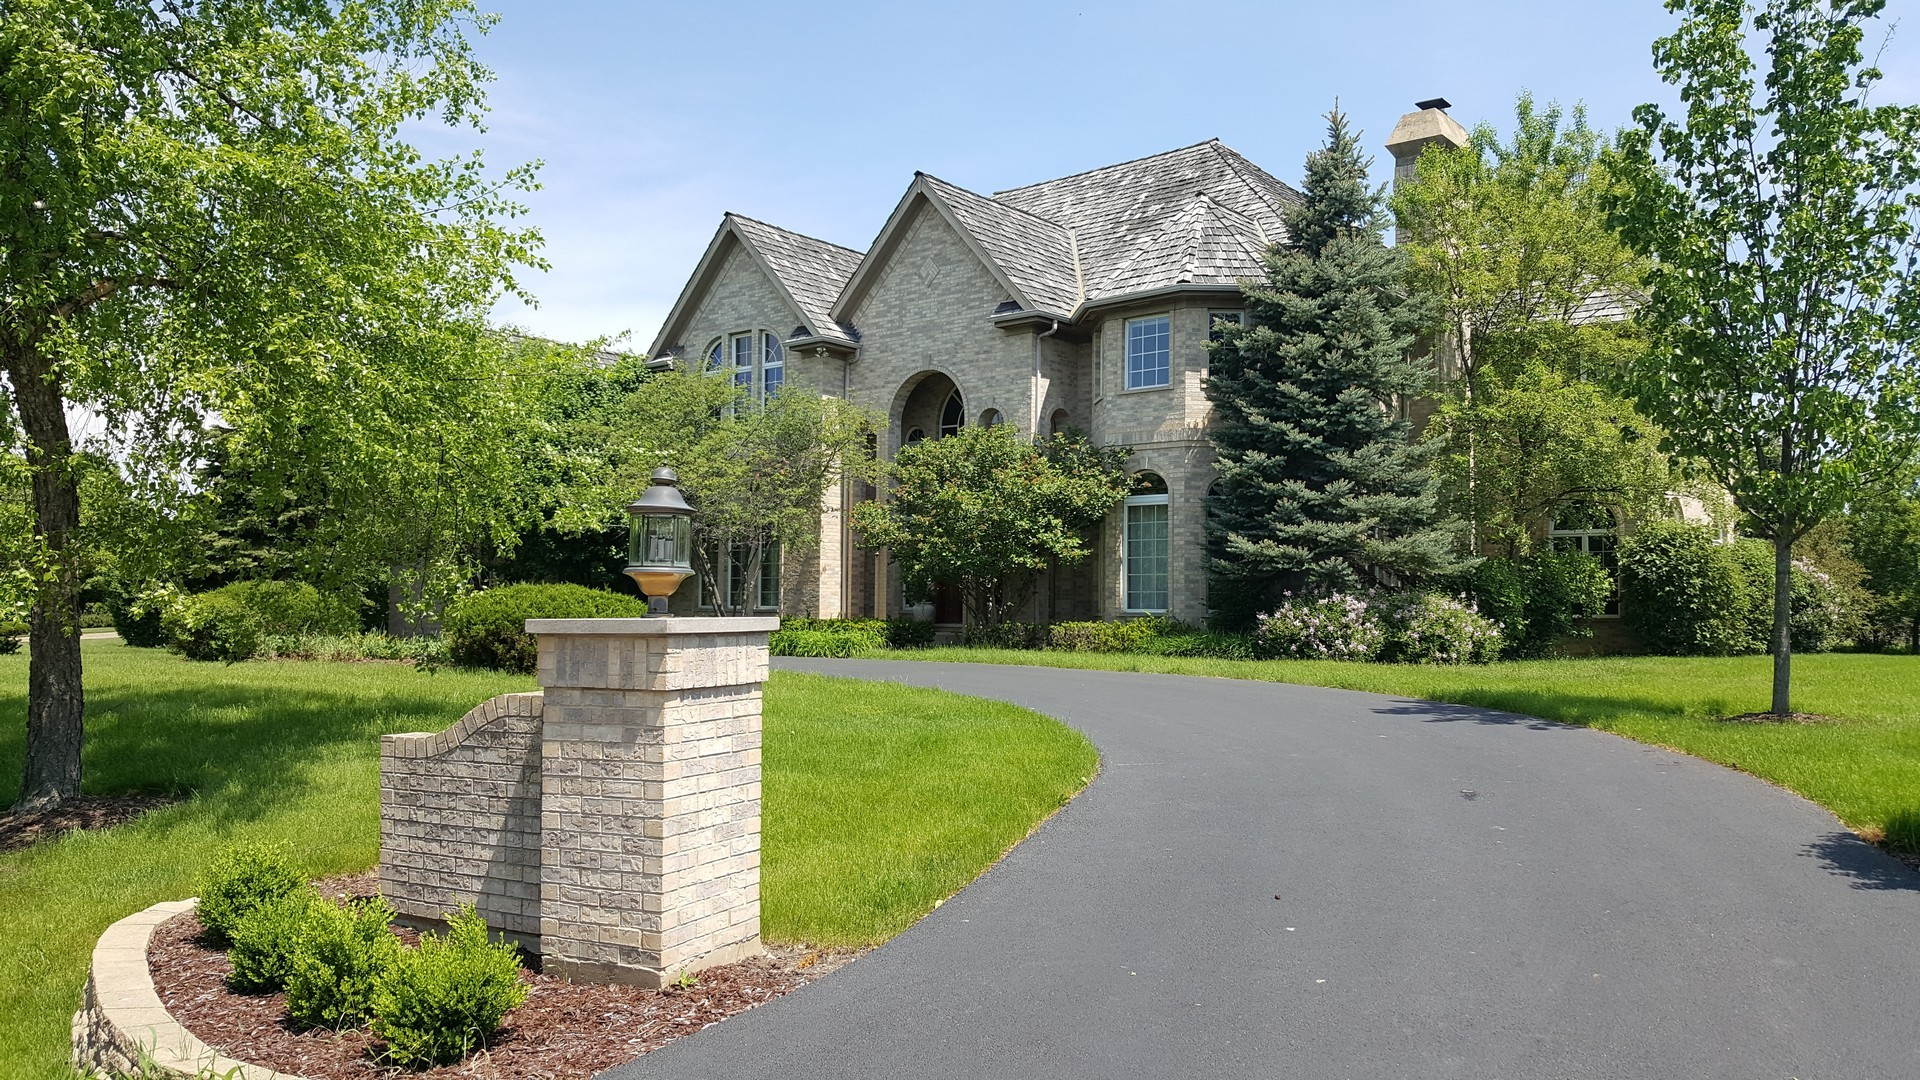 1742 Tanager Way, Long Grove, Illinois 60047